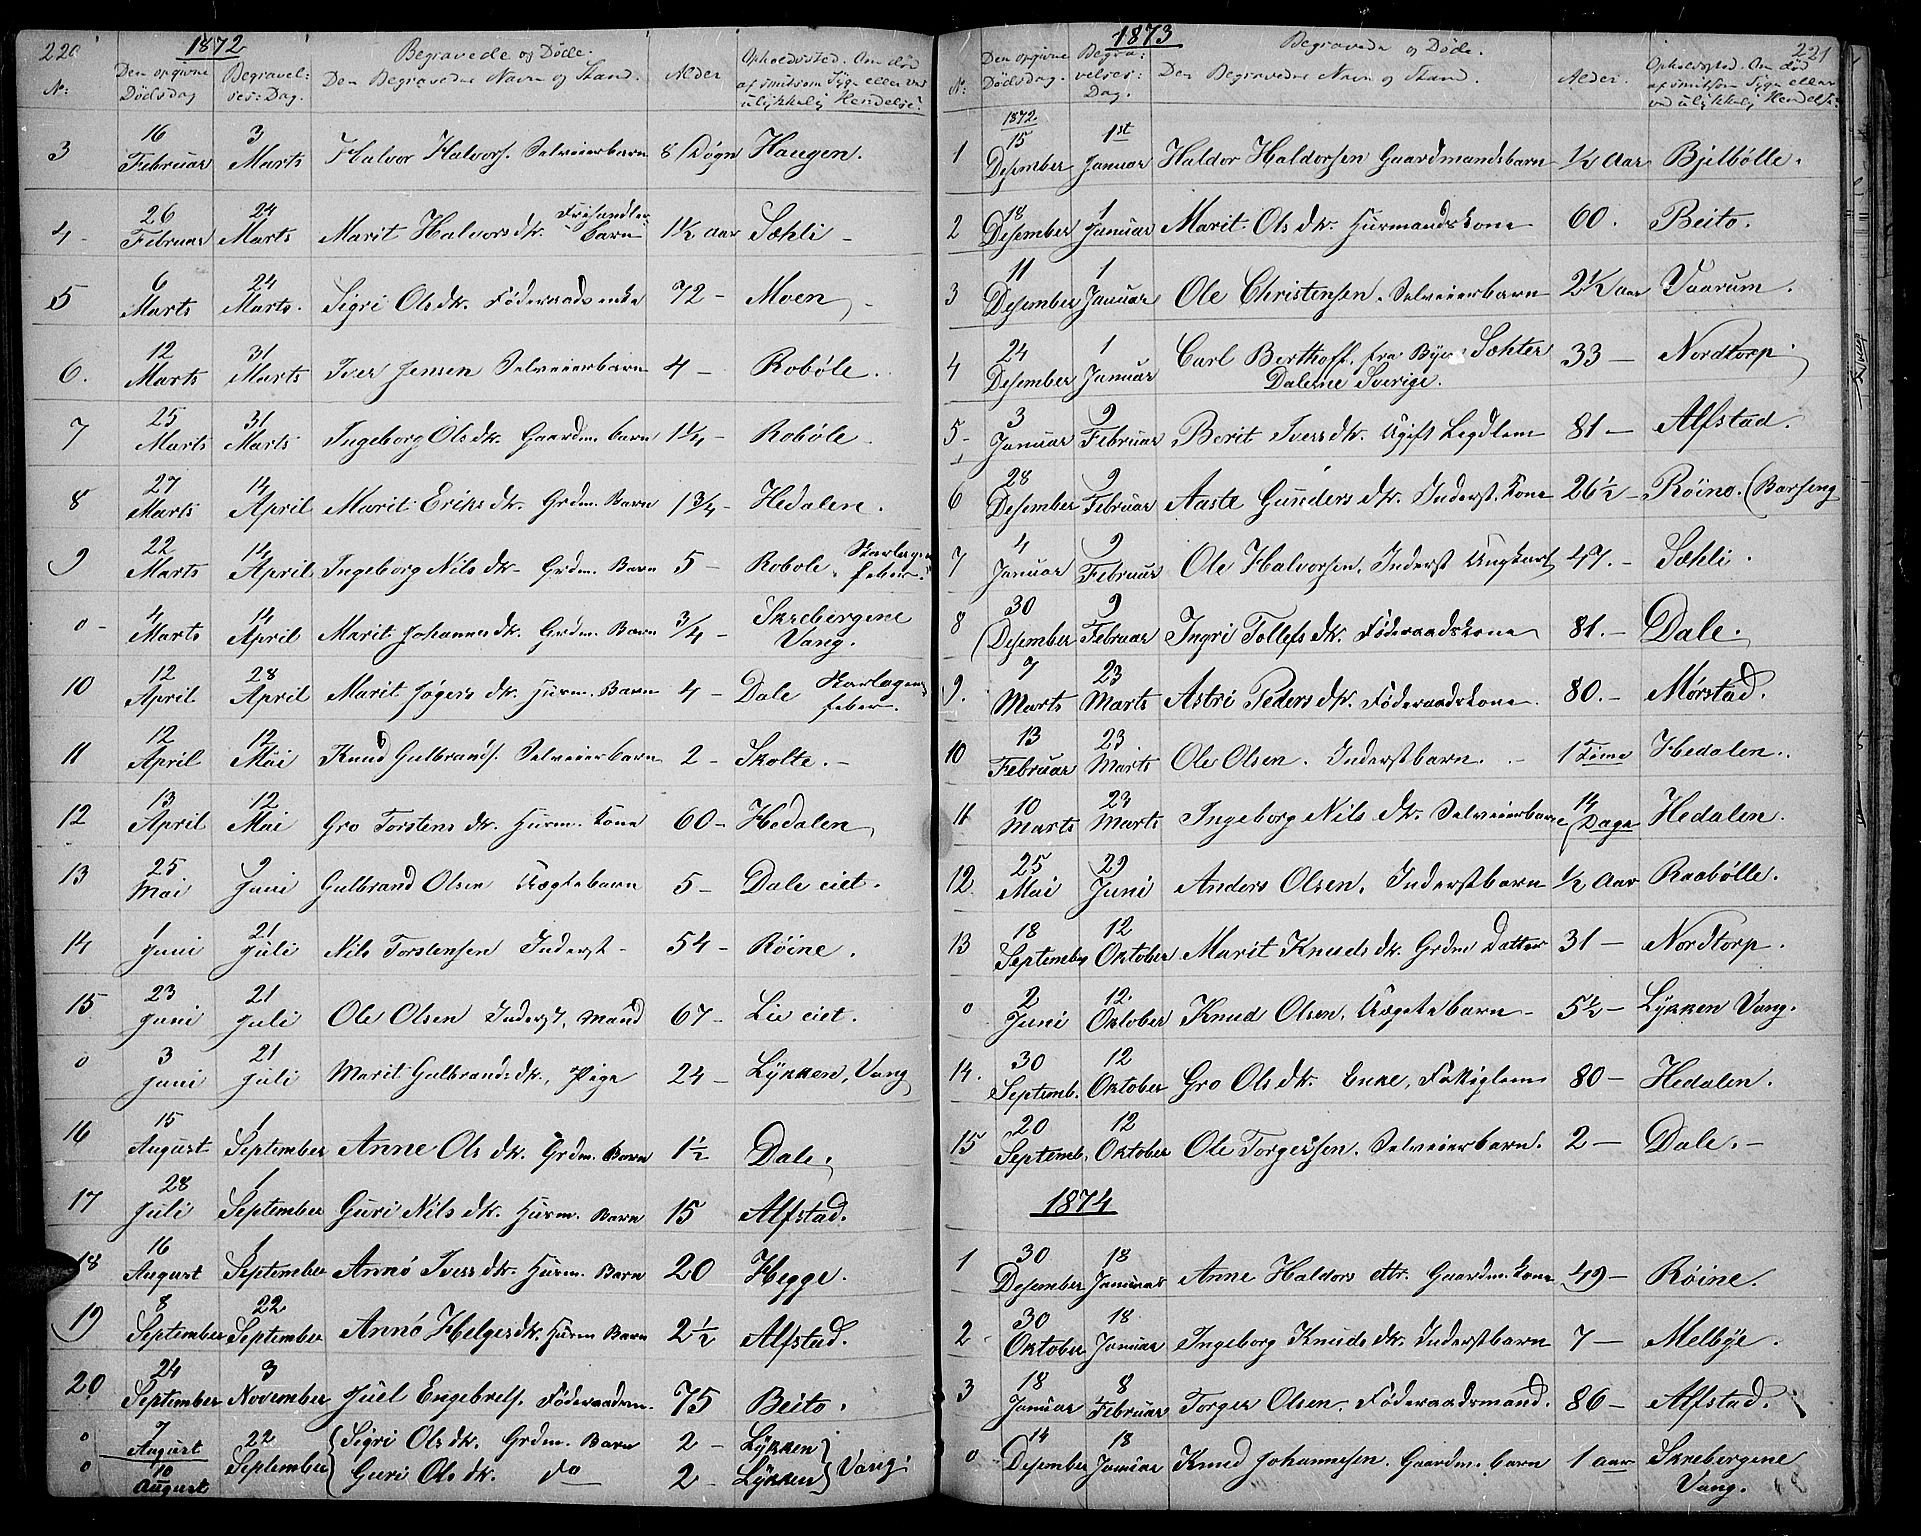 SAH, Øystre Slidre prestekontor, Klokkerbok nr. 1, 1866-1886, s. 220-221